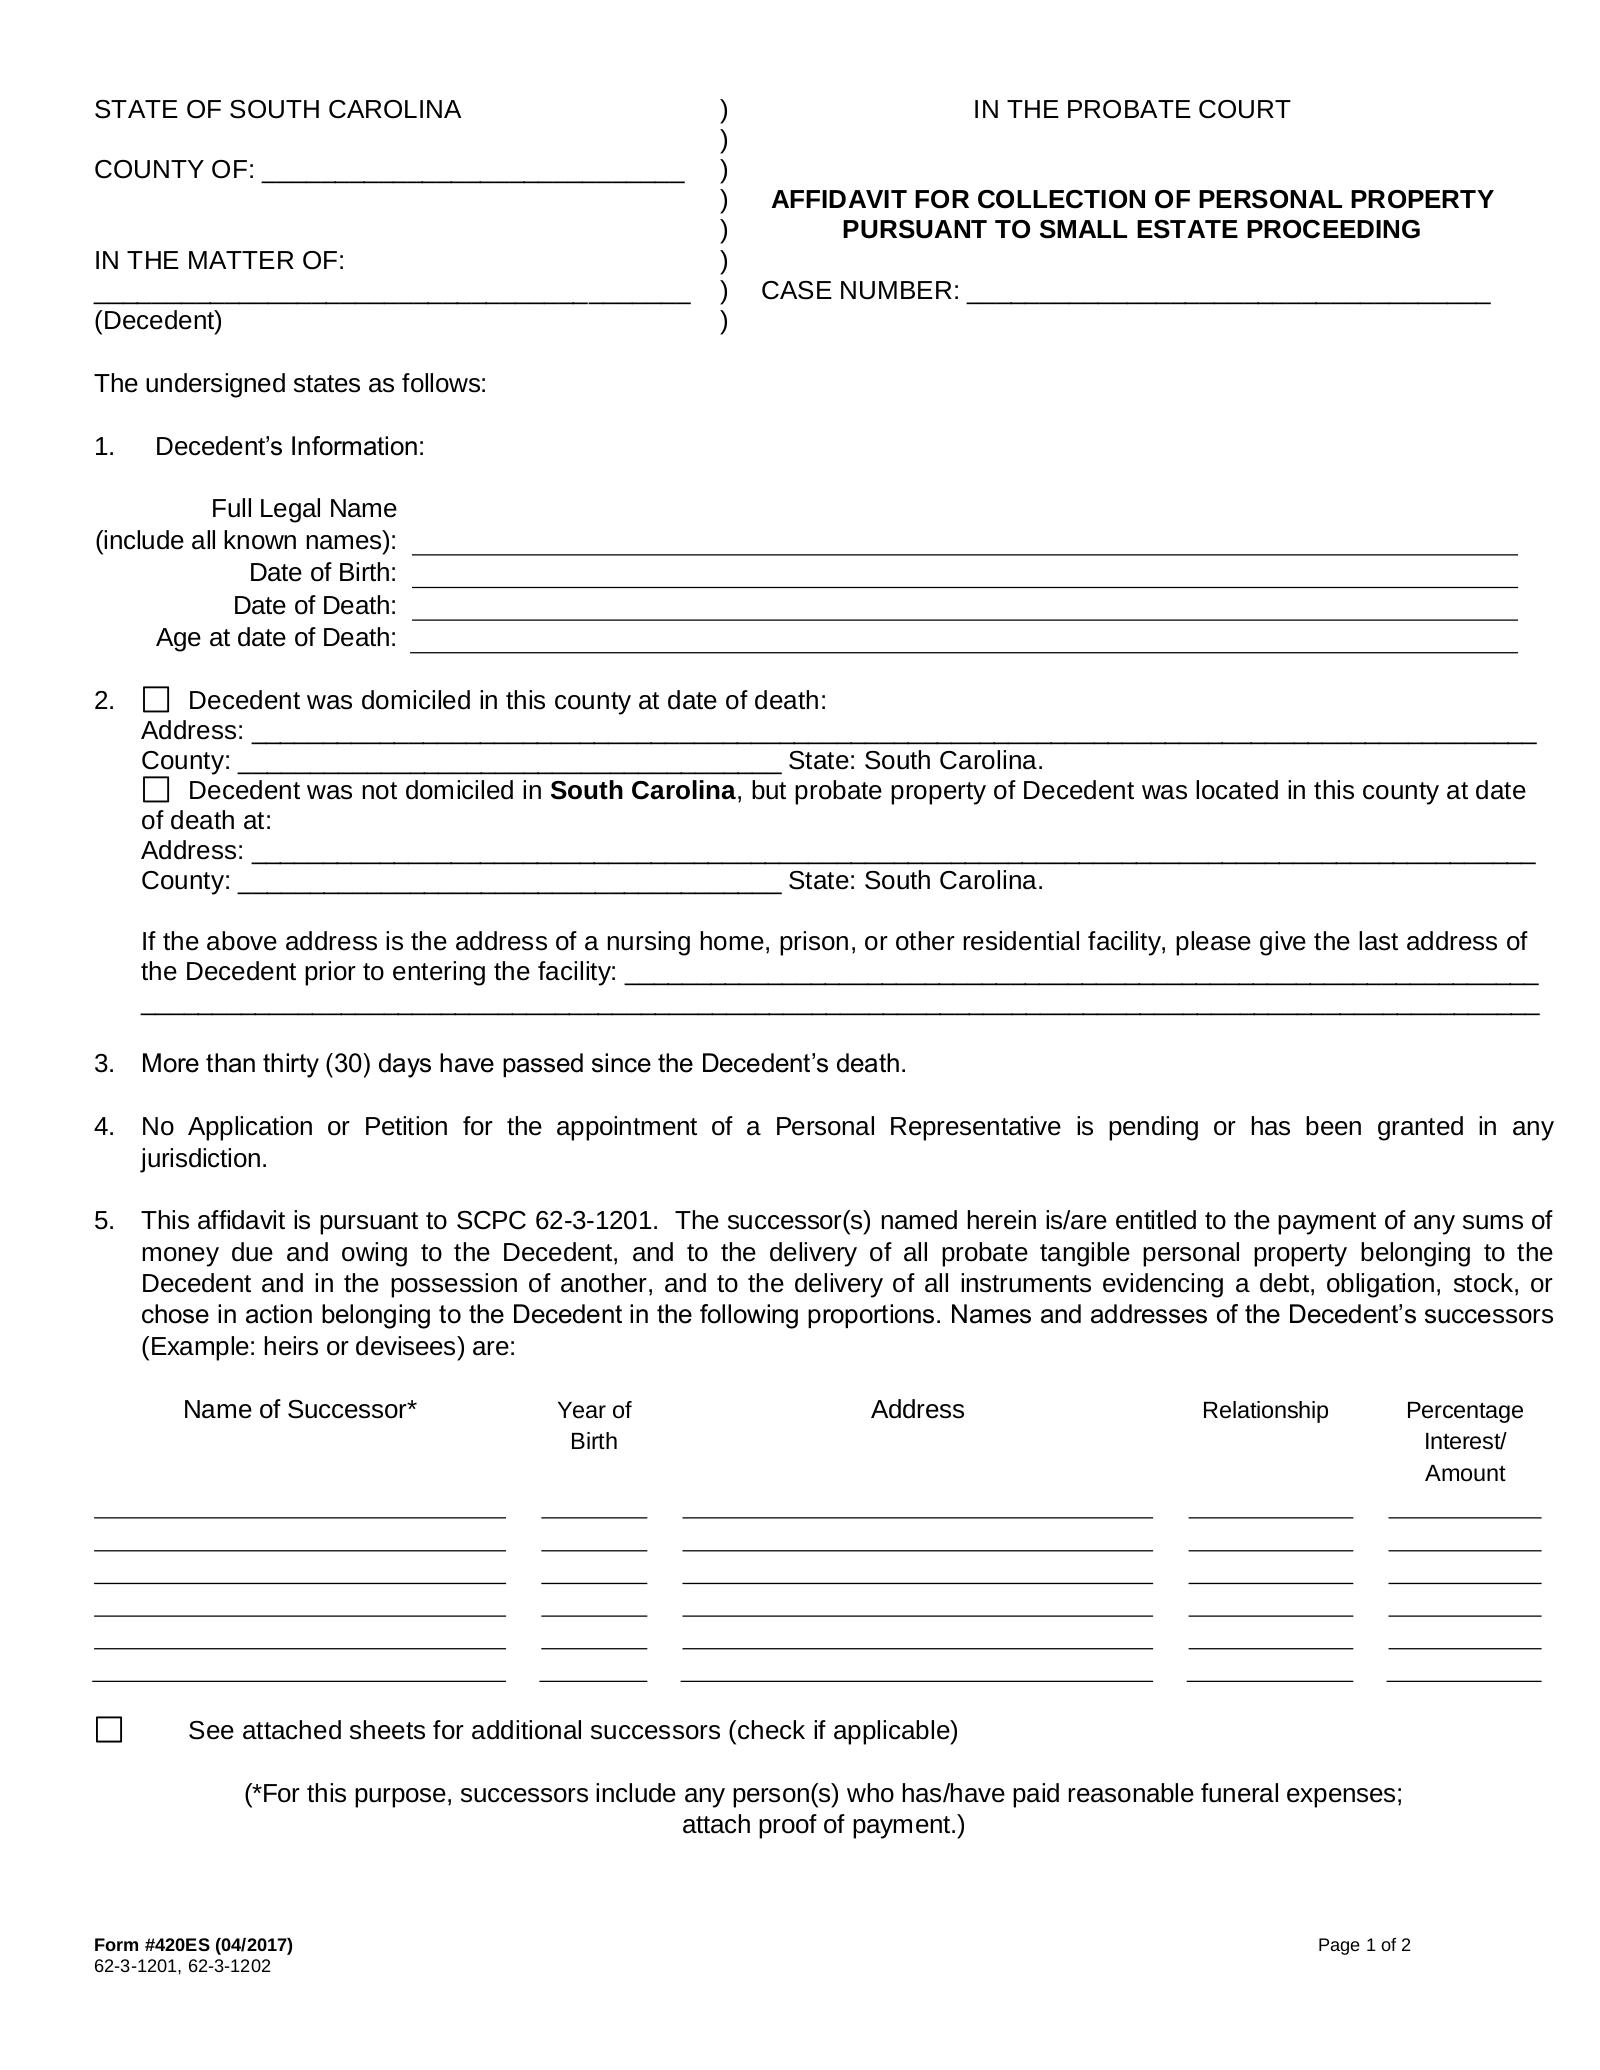 Free South Carolina Small Estate Affidavit | Form 420ES